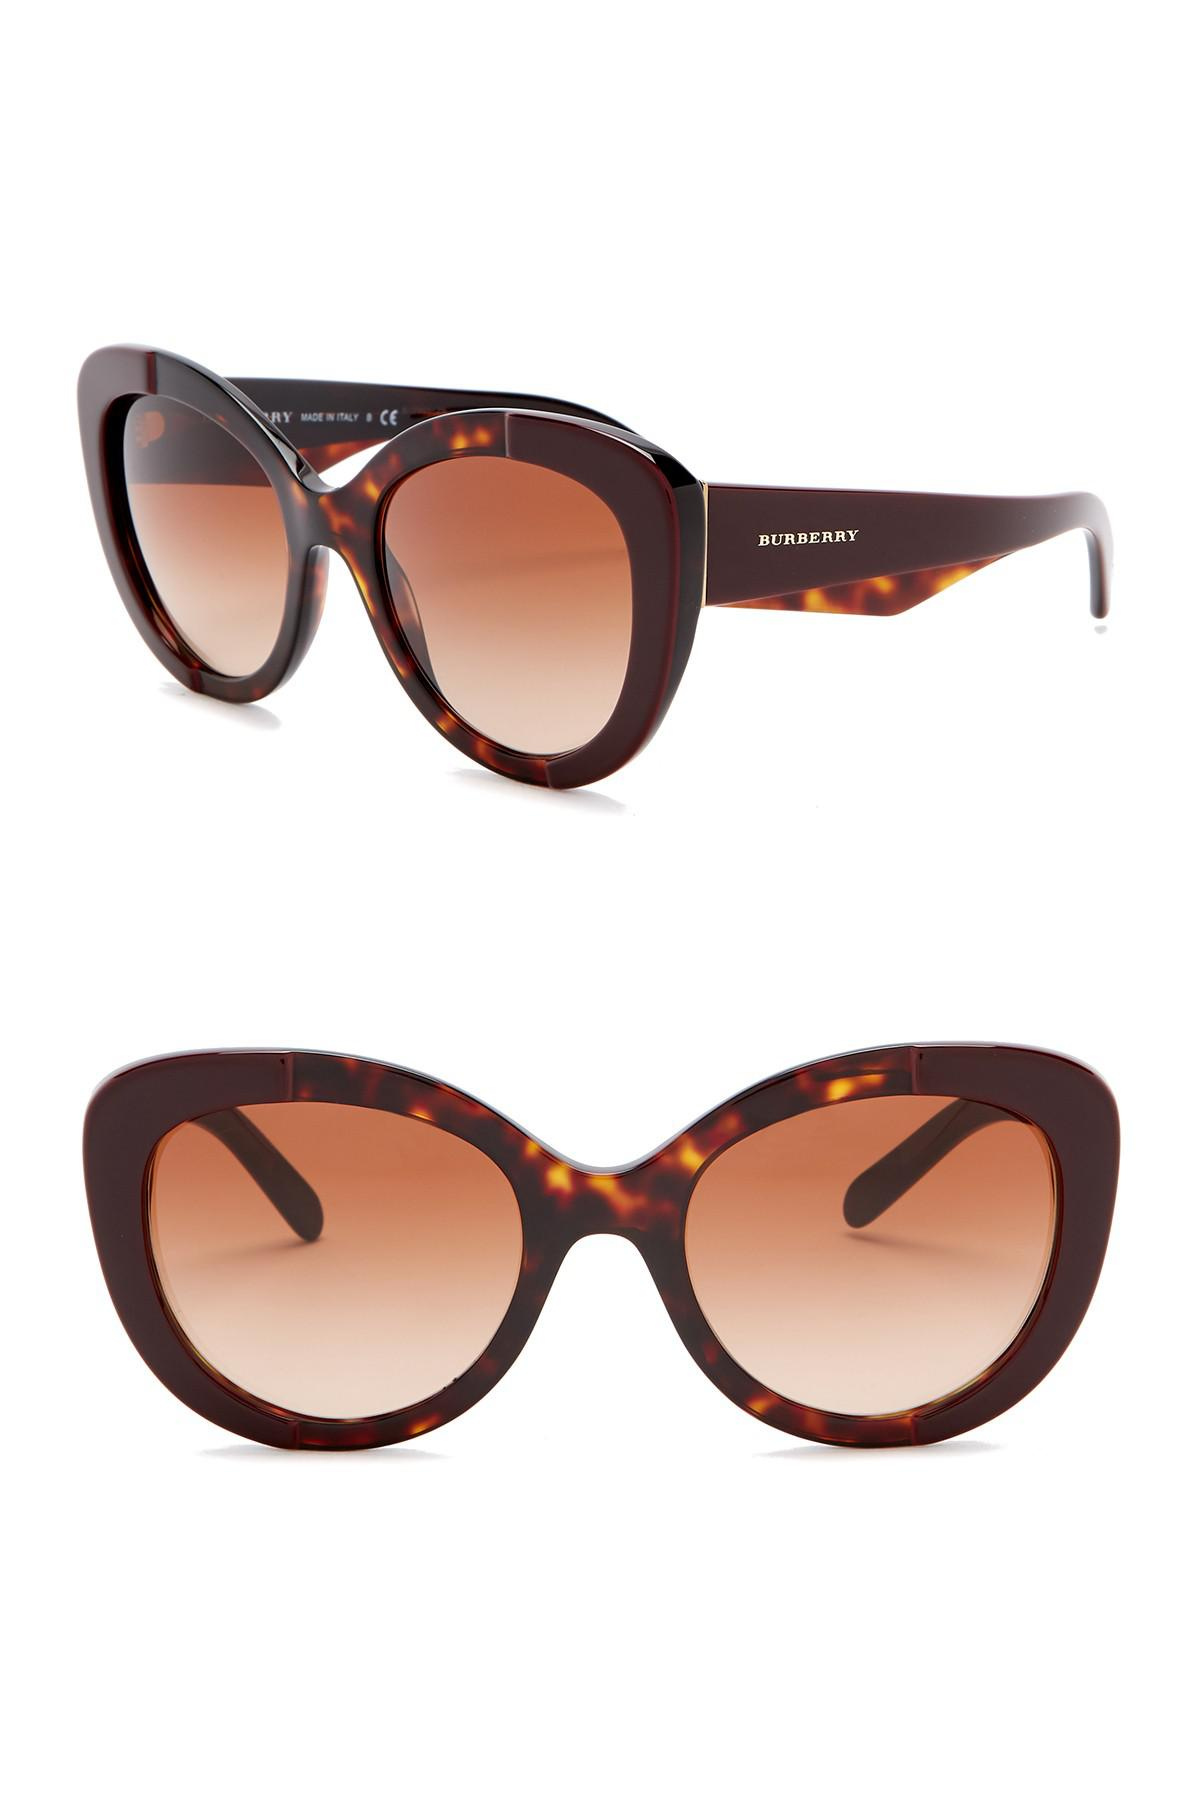 7125b99cfb Burberry - Brown 54mm Butterfly Sunglasses - Lyst. View fullscreen